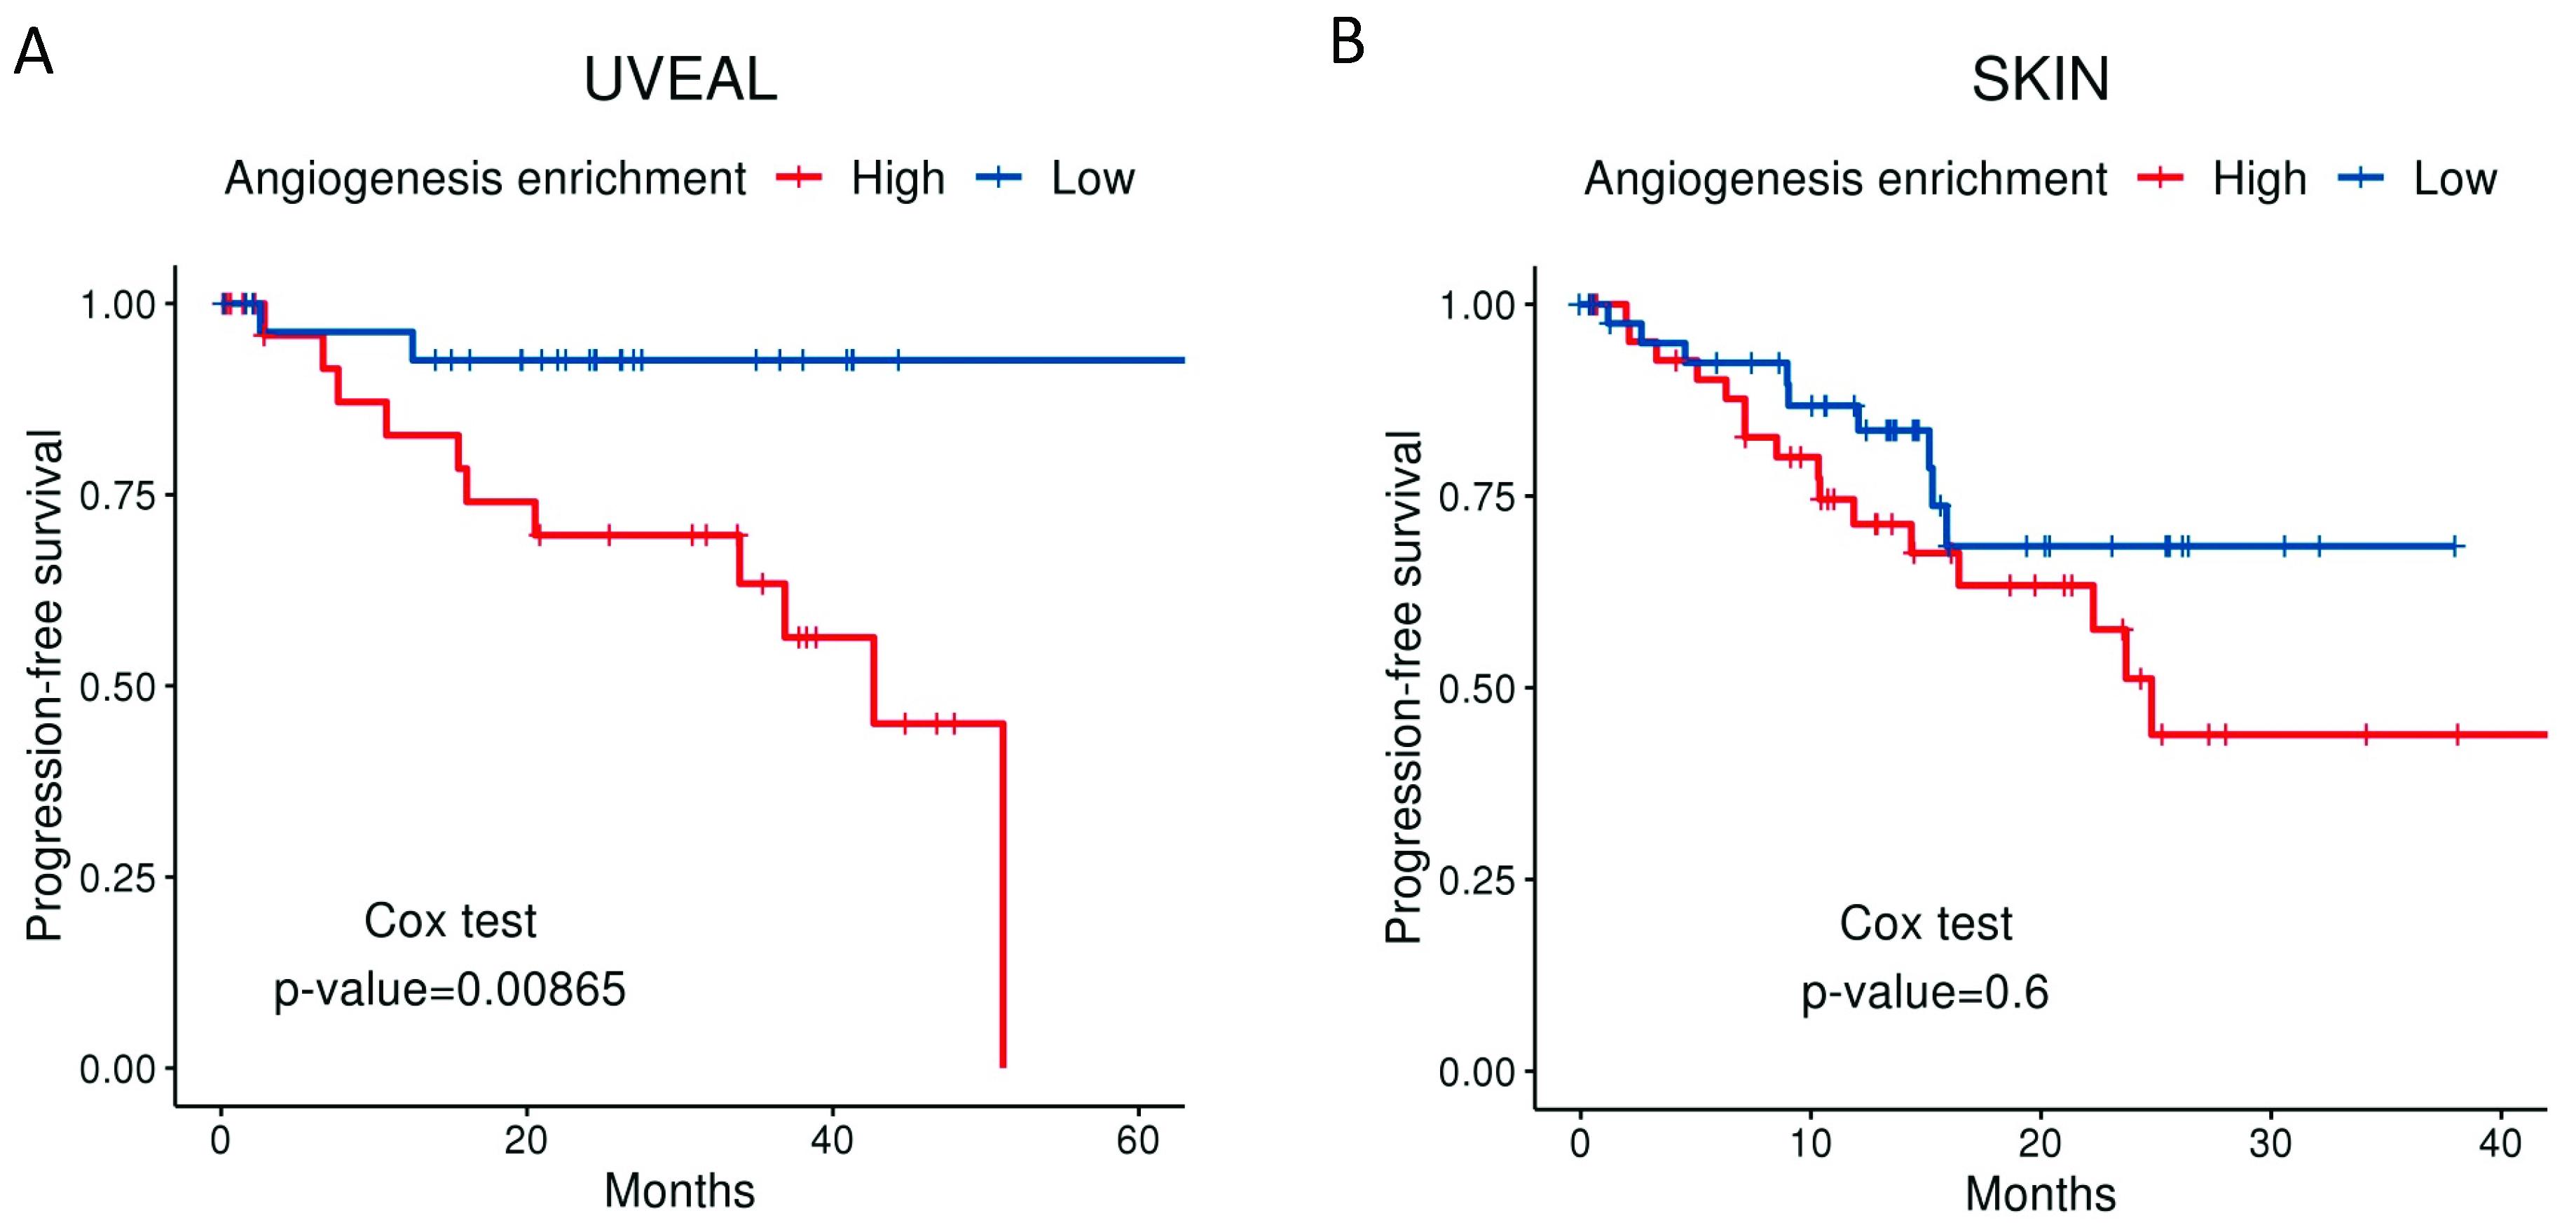 Cancers | Free Full-Text | Uveal Melanoma, Angiogenesis and